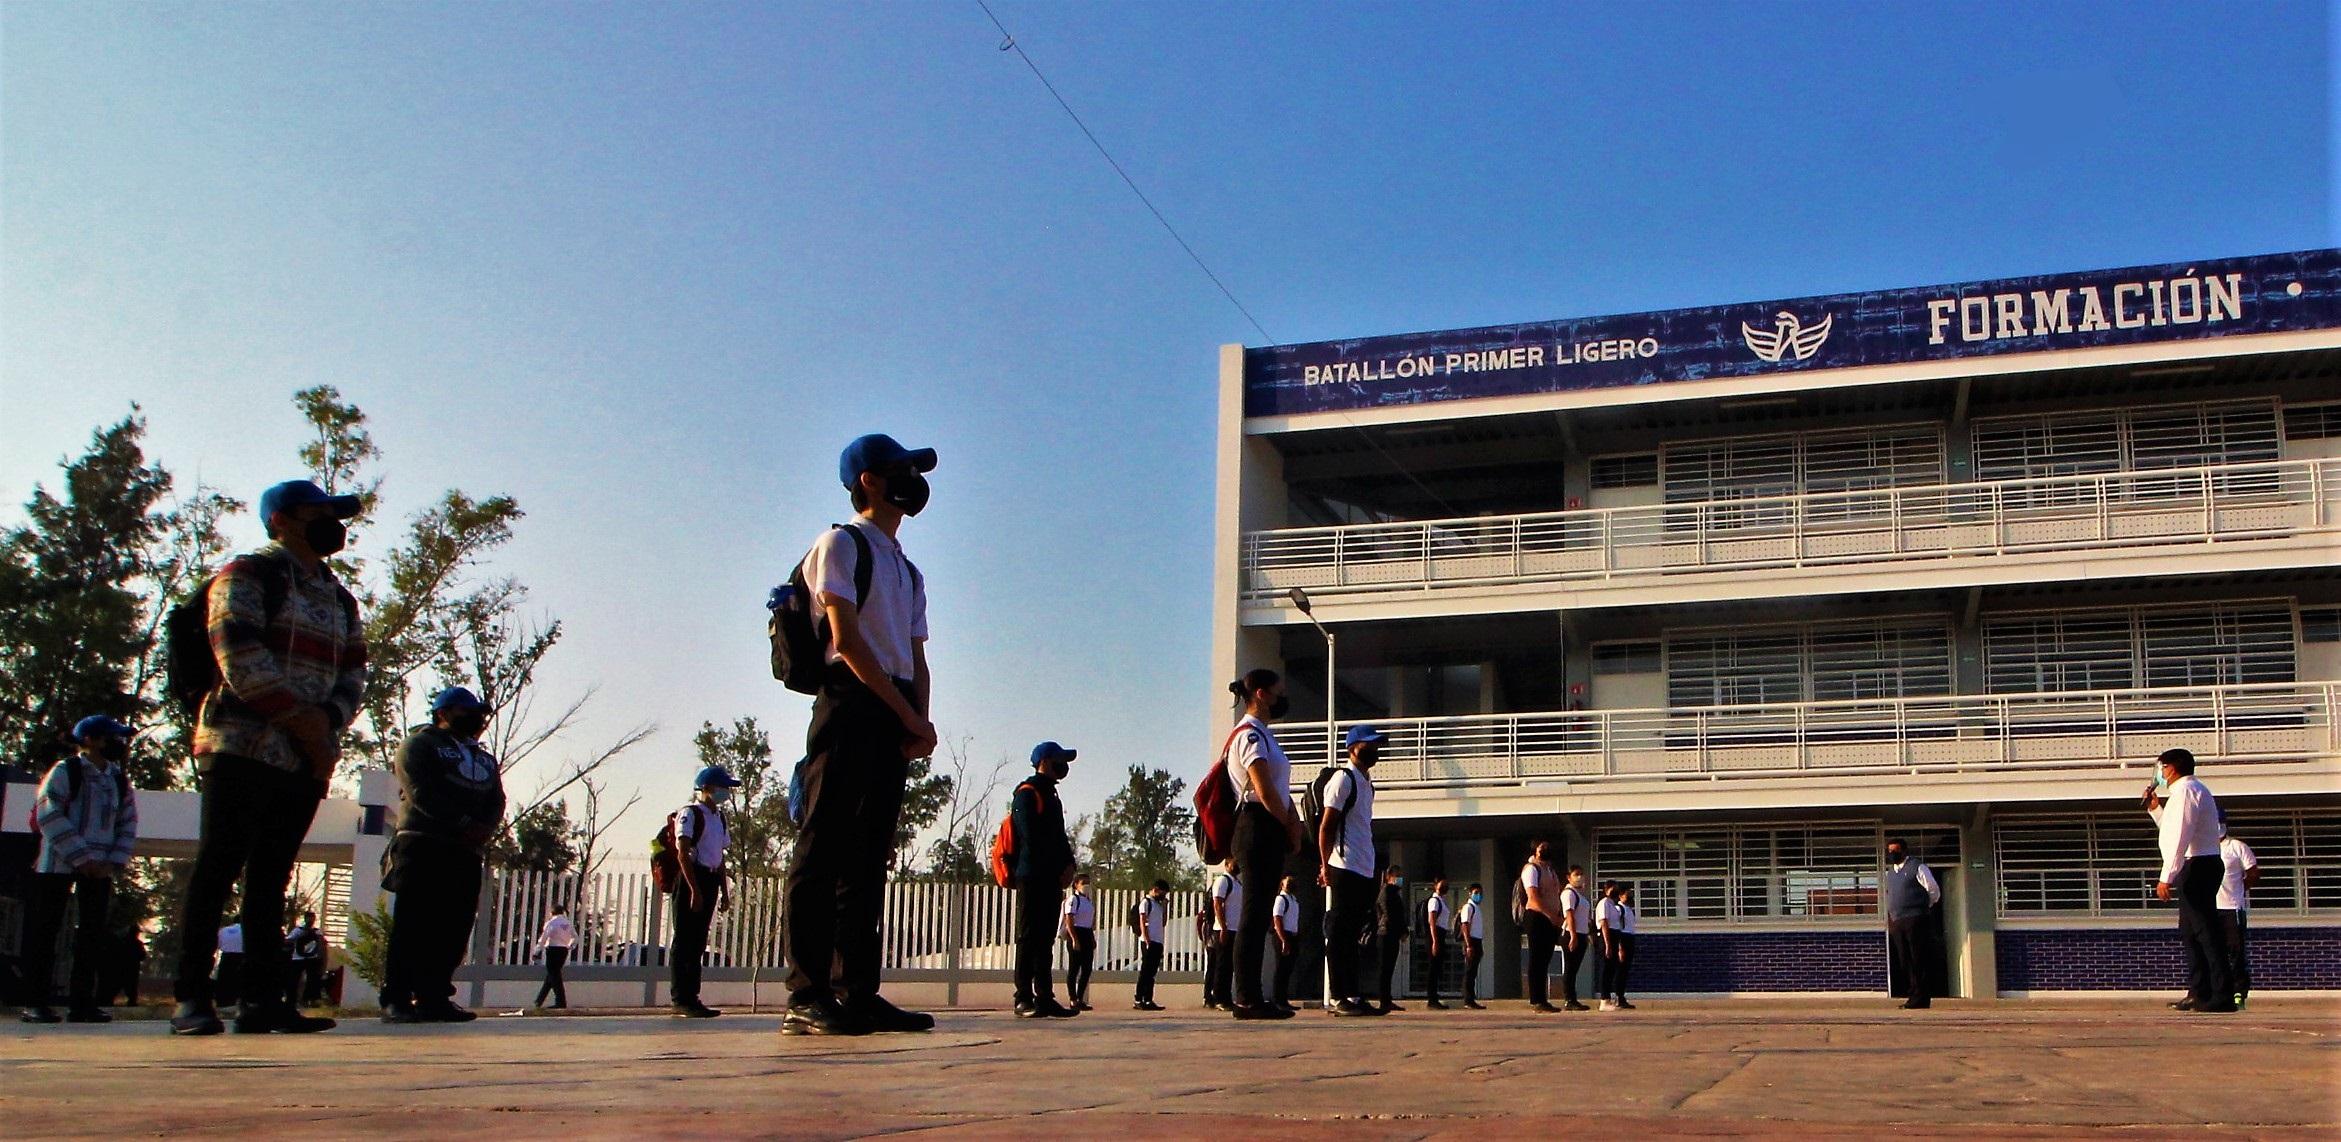 Bachillerato militarizado inicia pilotaje de clases presenciales